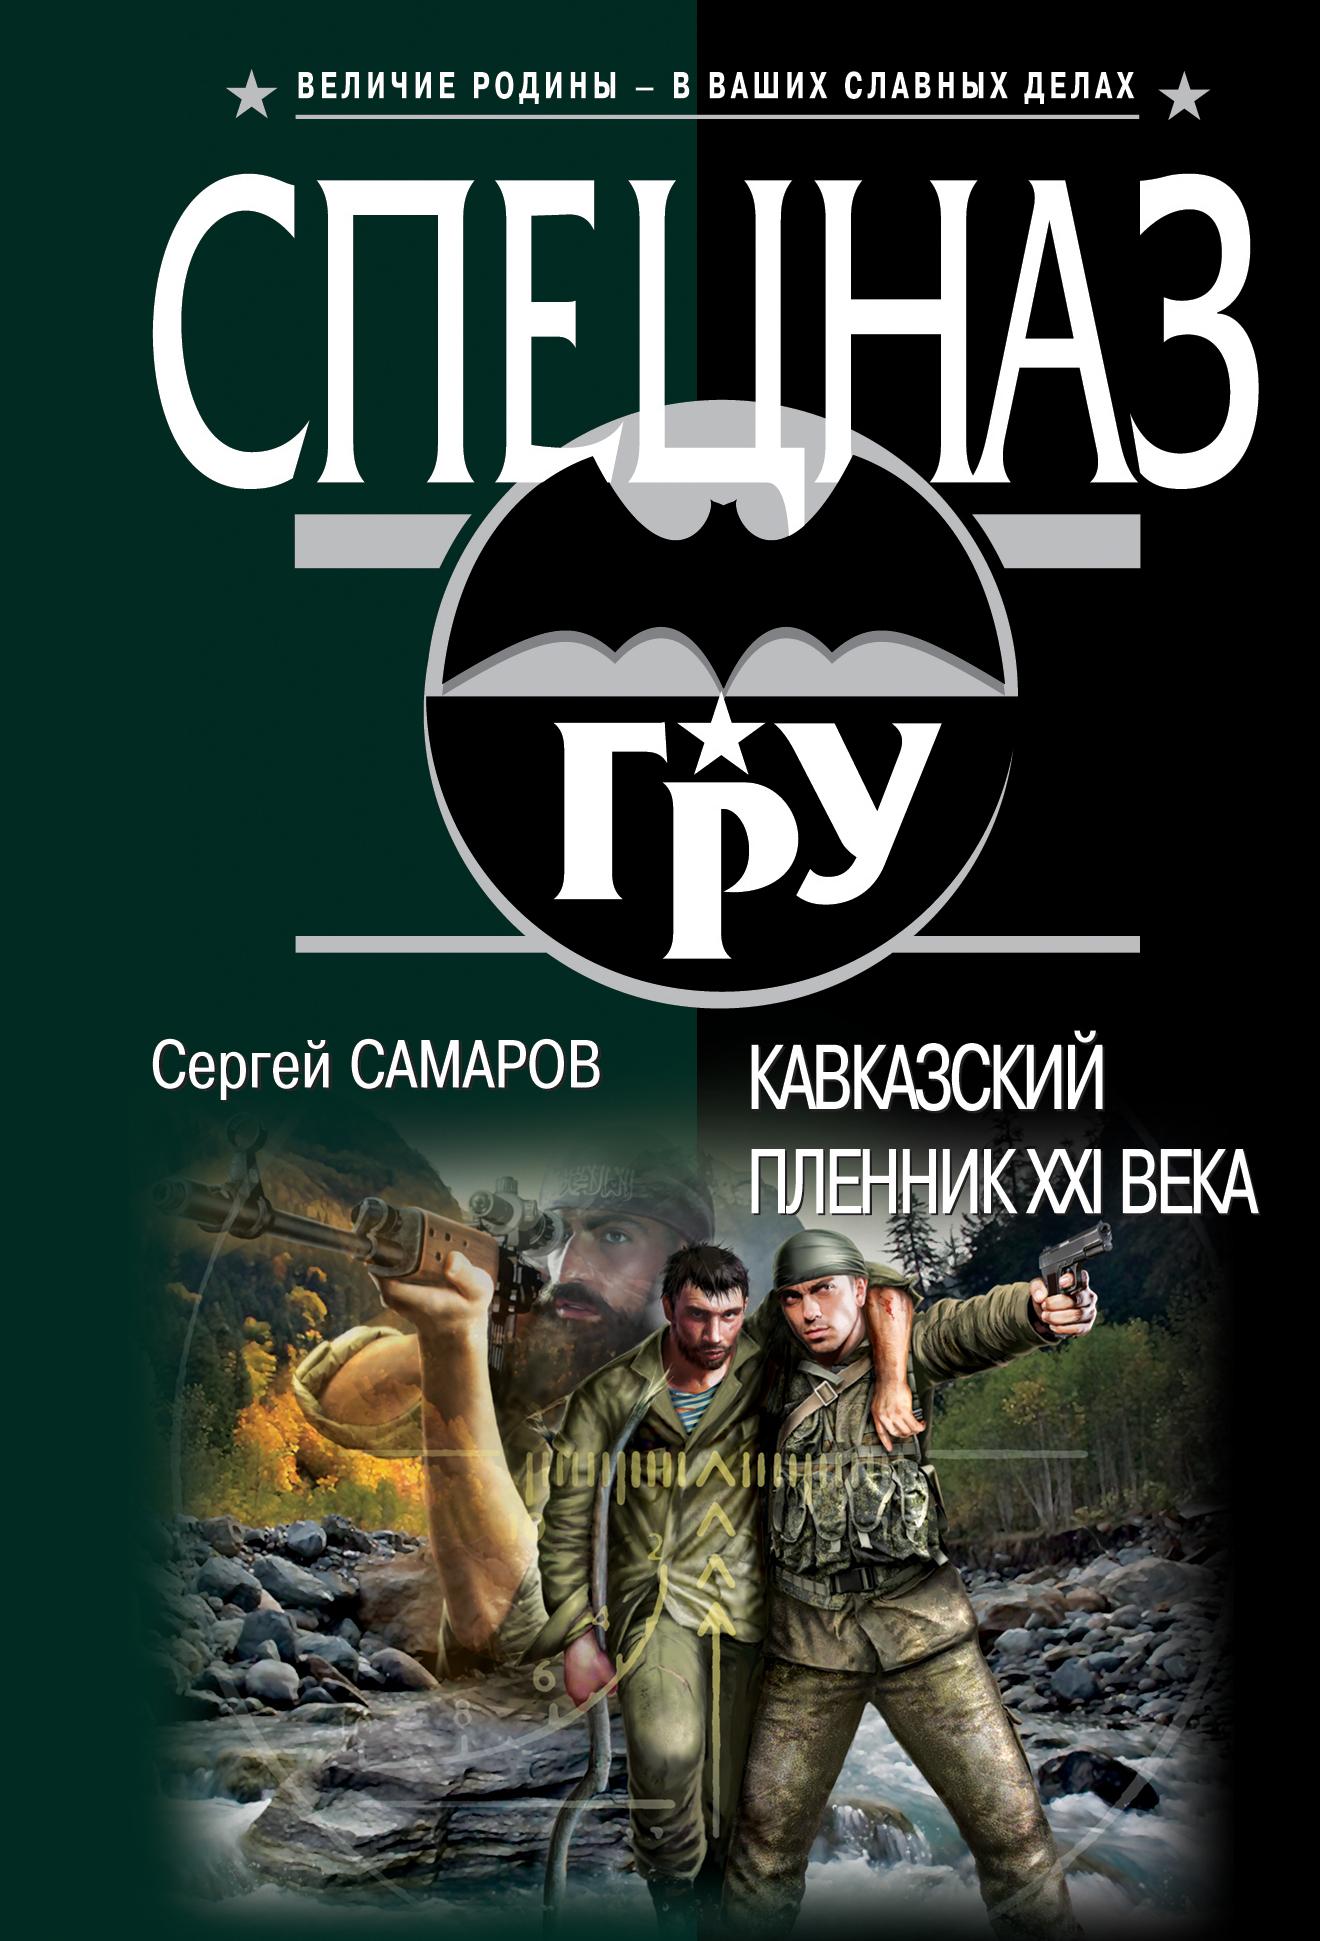 Кавказский пленник XXI века